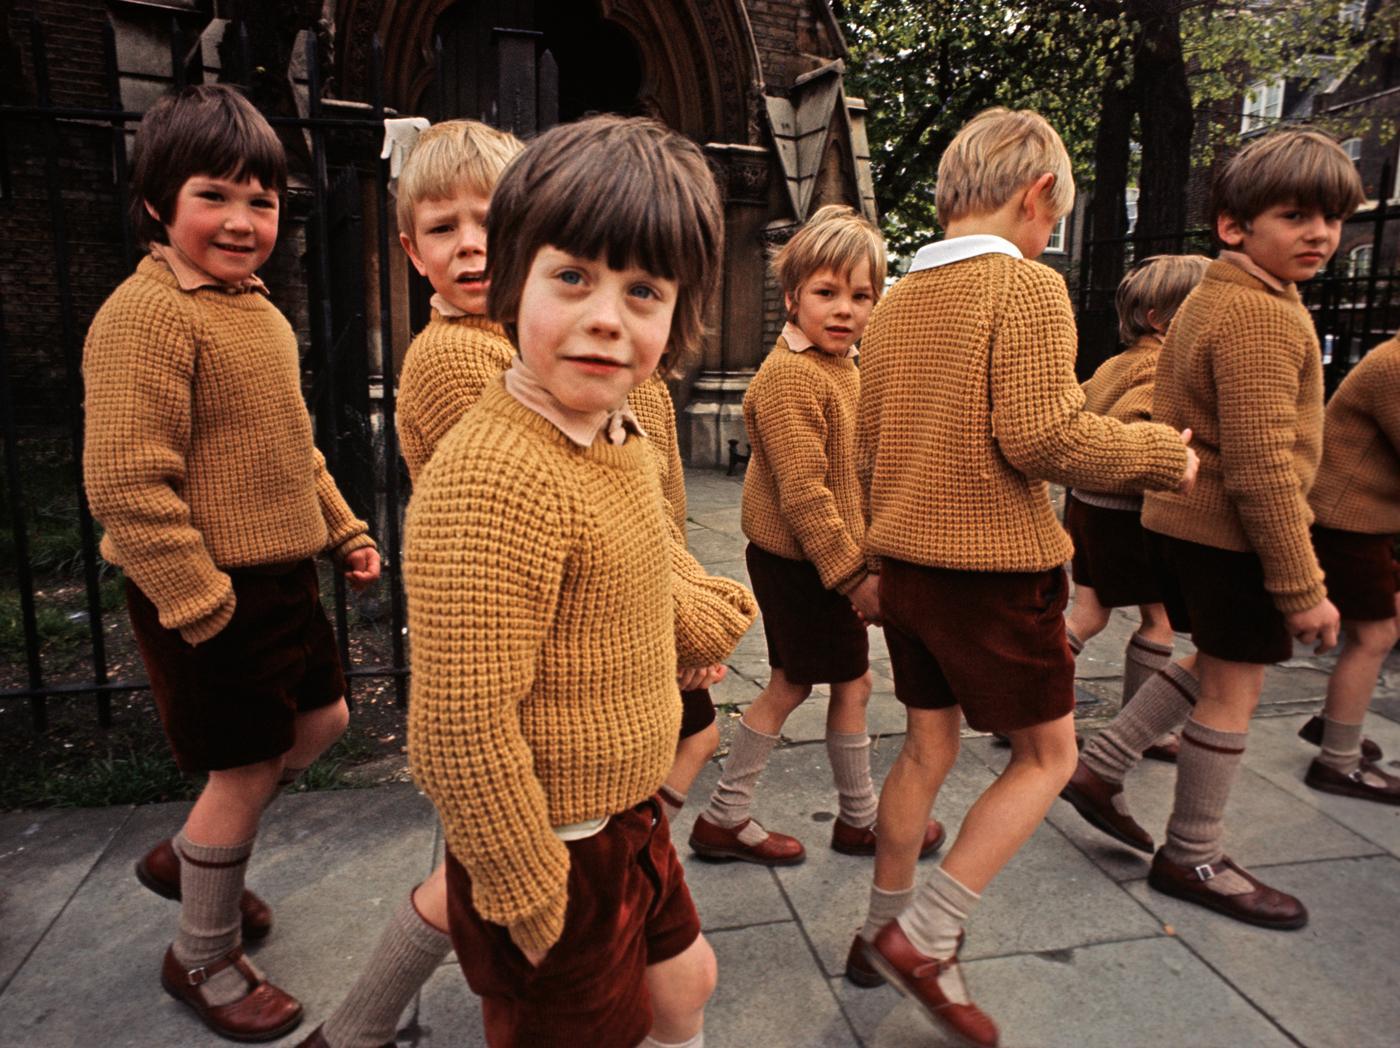 e846cb96cd The British schoolboy look, circa 1972